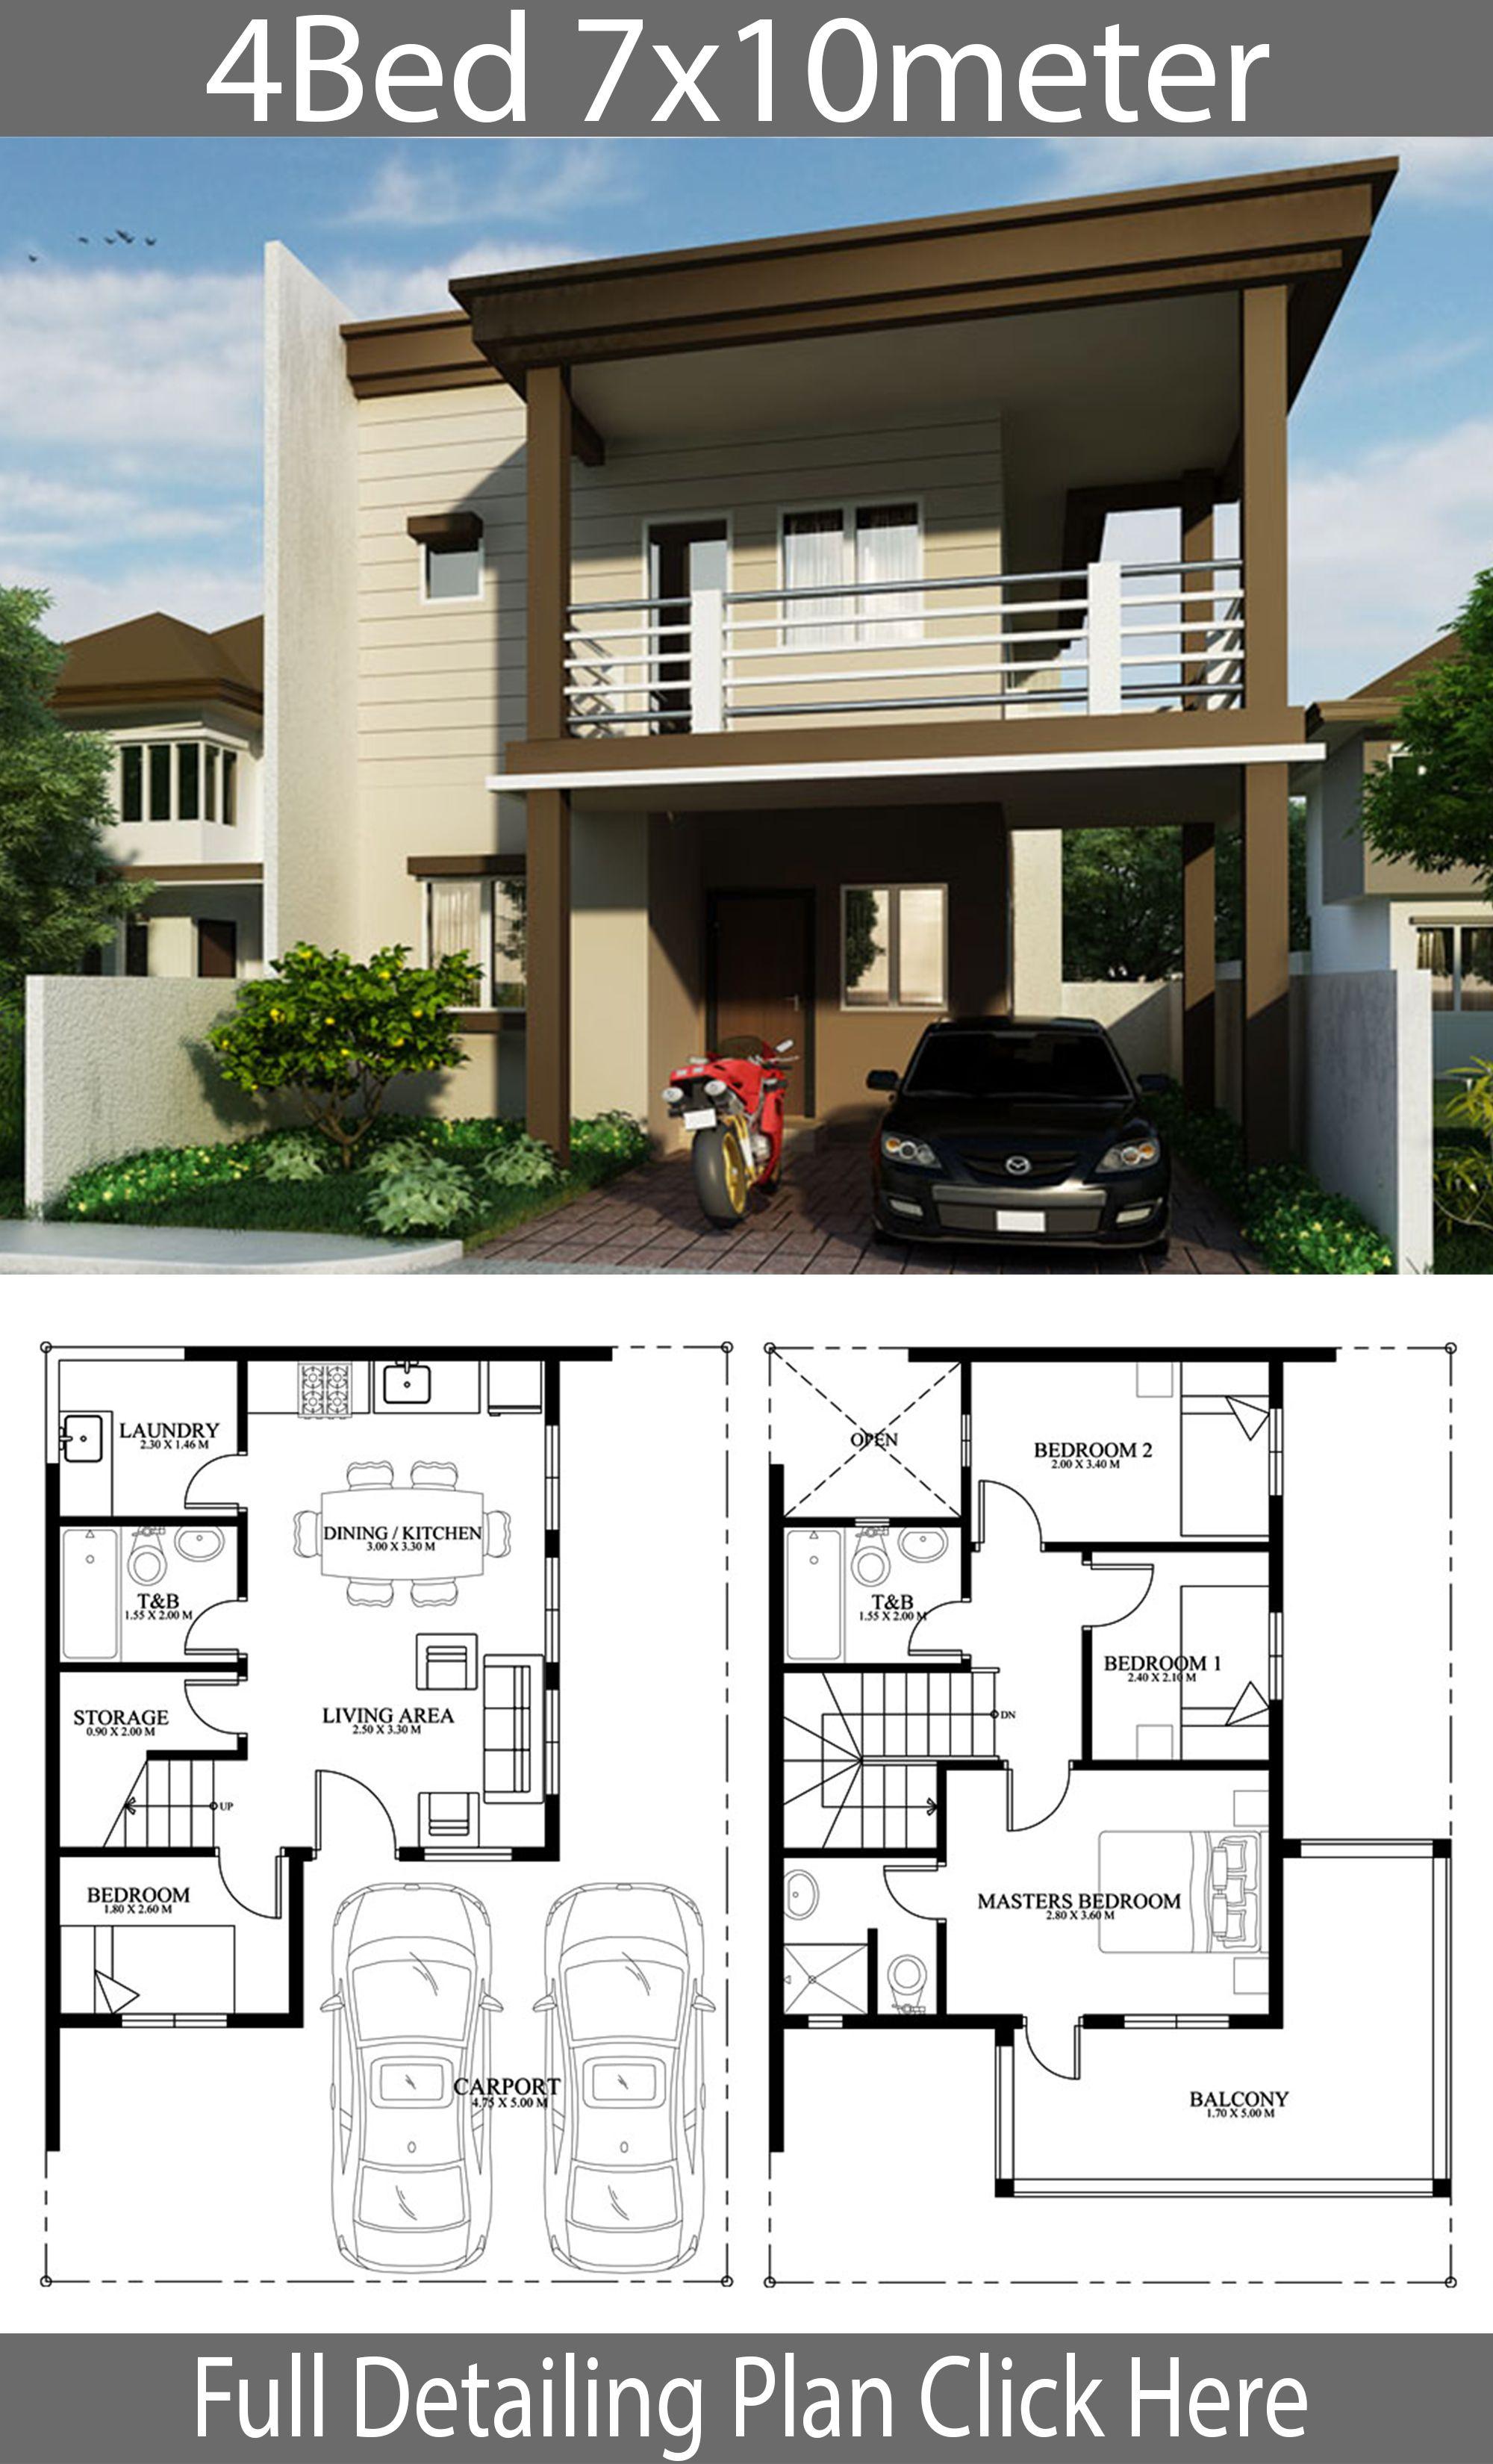 Home Design Plan 7x10m With 4 Bedrooms House Plans S Model House Plan House Front Design Small House Design Plans